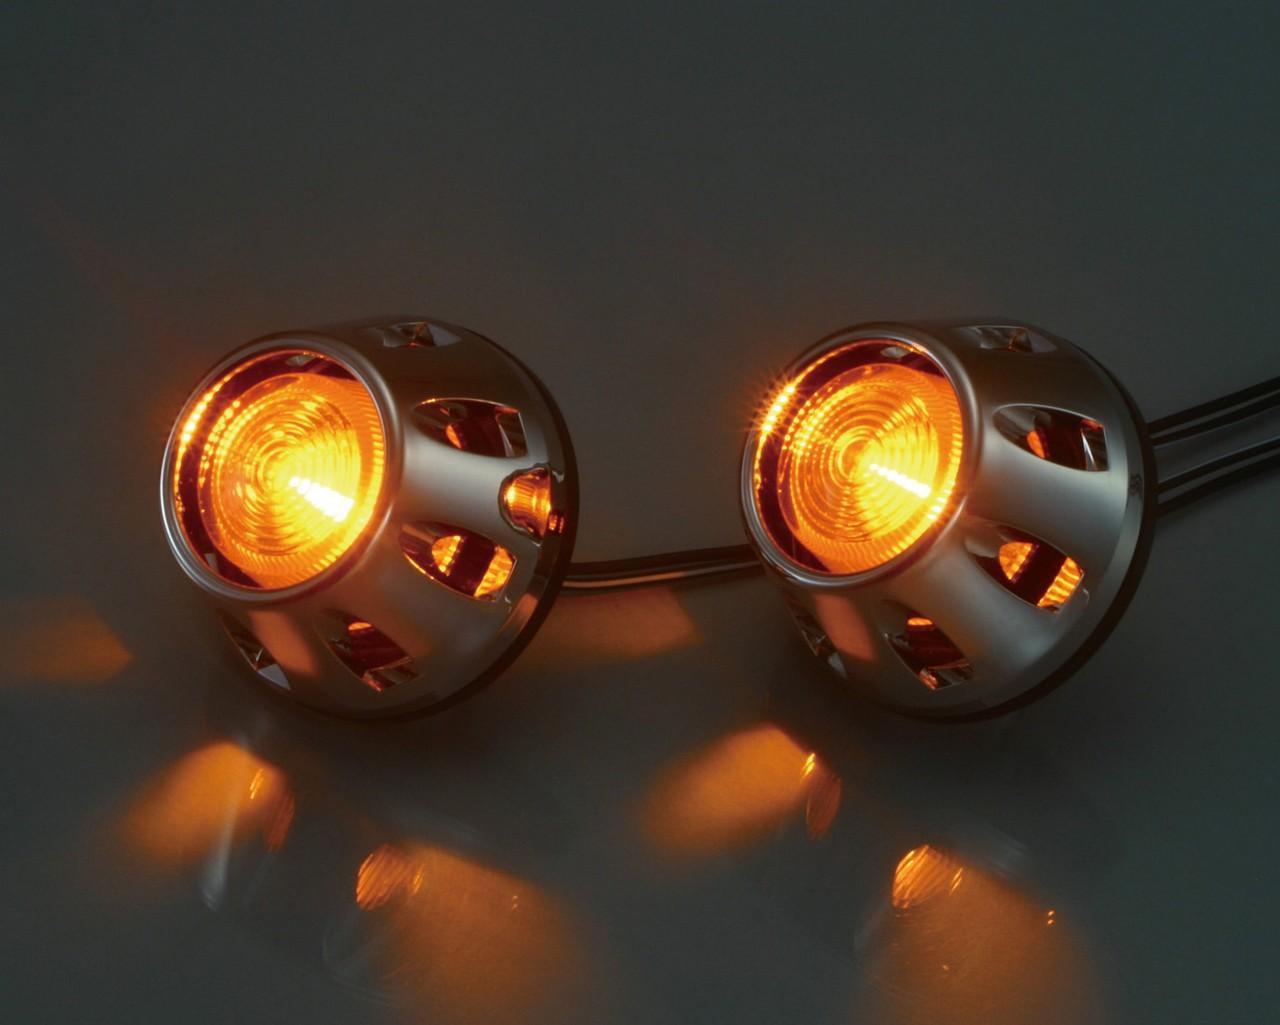 【KITACO】方向燈組 - 「Webike-摩托百貨」